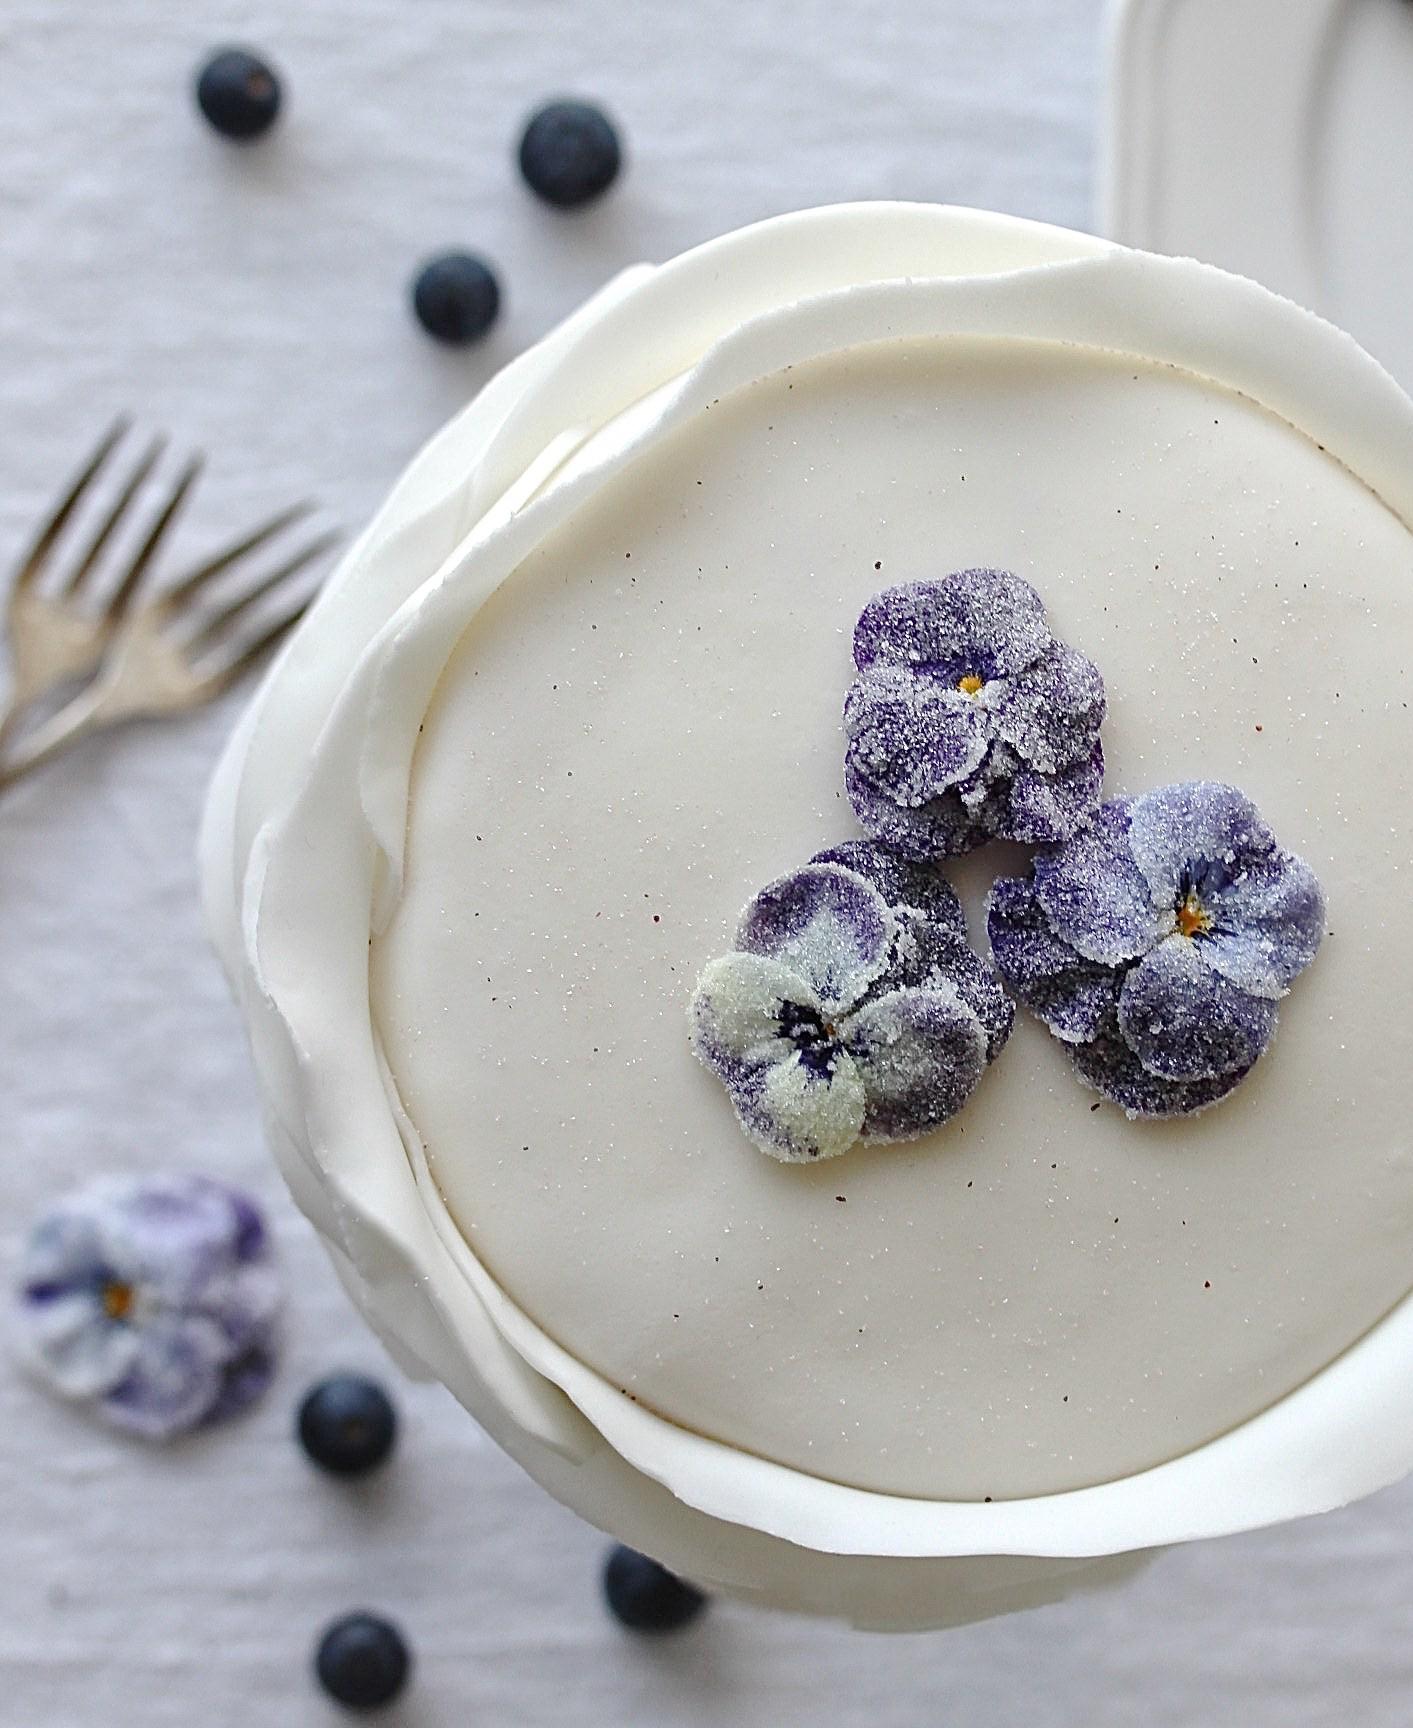 Muttertags Rezept: Blaubeer Fondant Torte mit gezuckerten Blüten backen Hornveilchen Motivtorte Hochzeitstorte weiße Torte #fondant #muttertag #hochzeit #cake #backen | Emma´s Lieblingsstücke